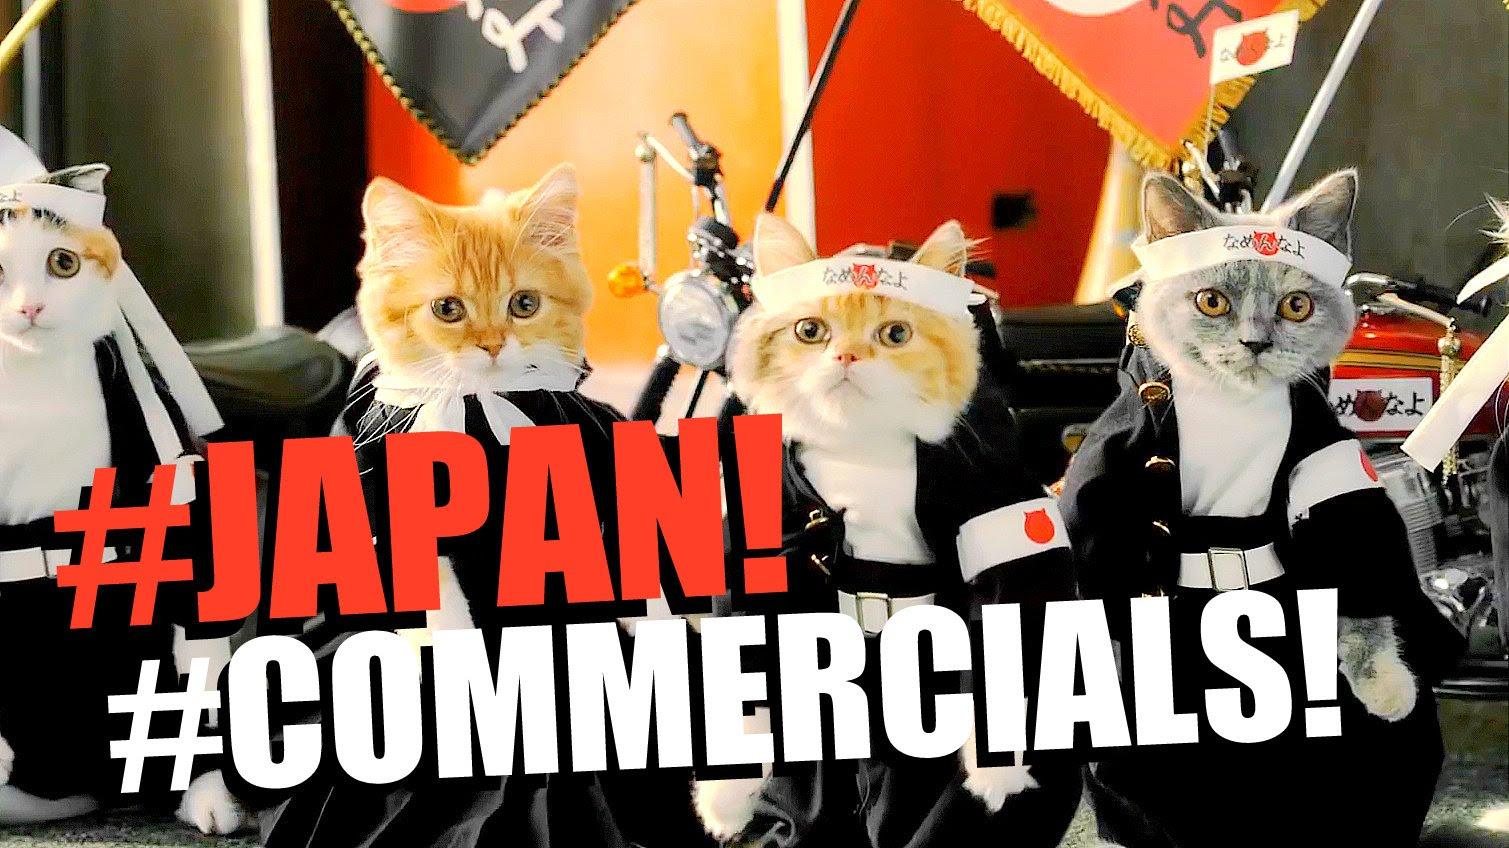 Japanese bizarre porn